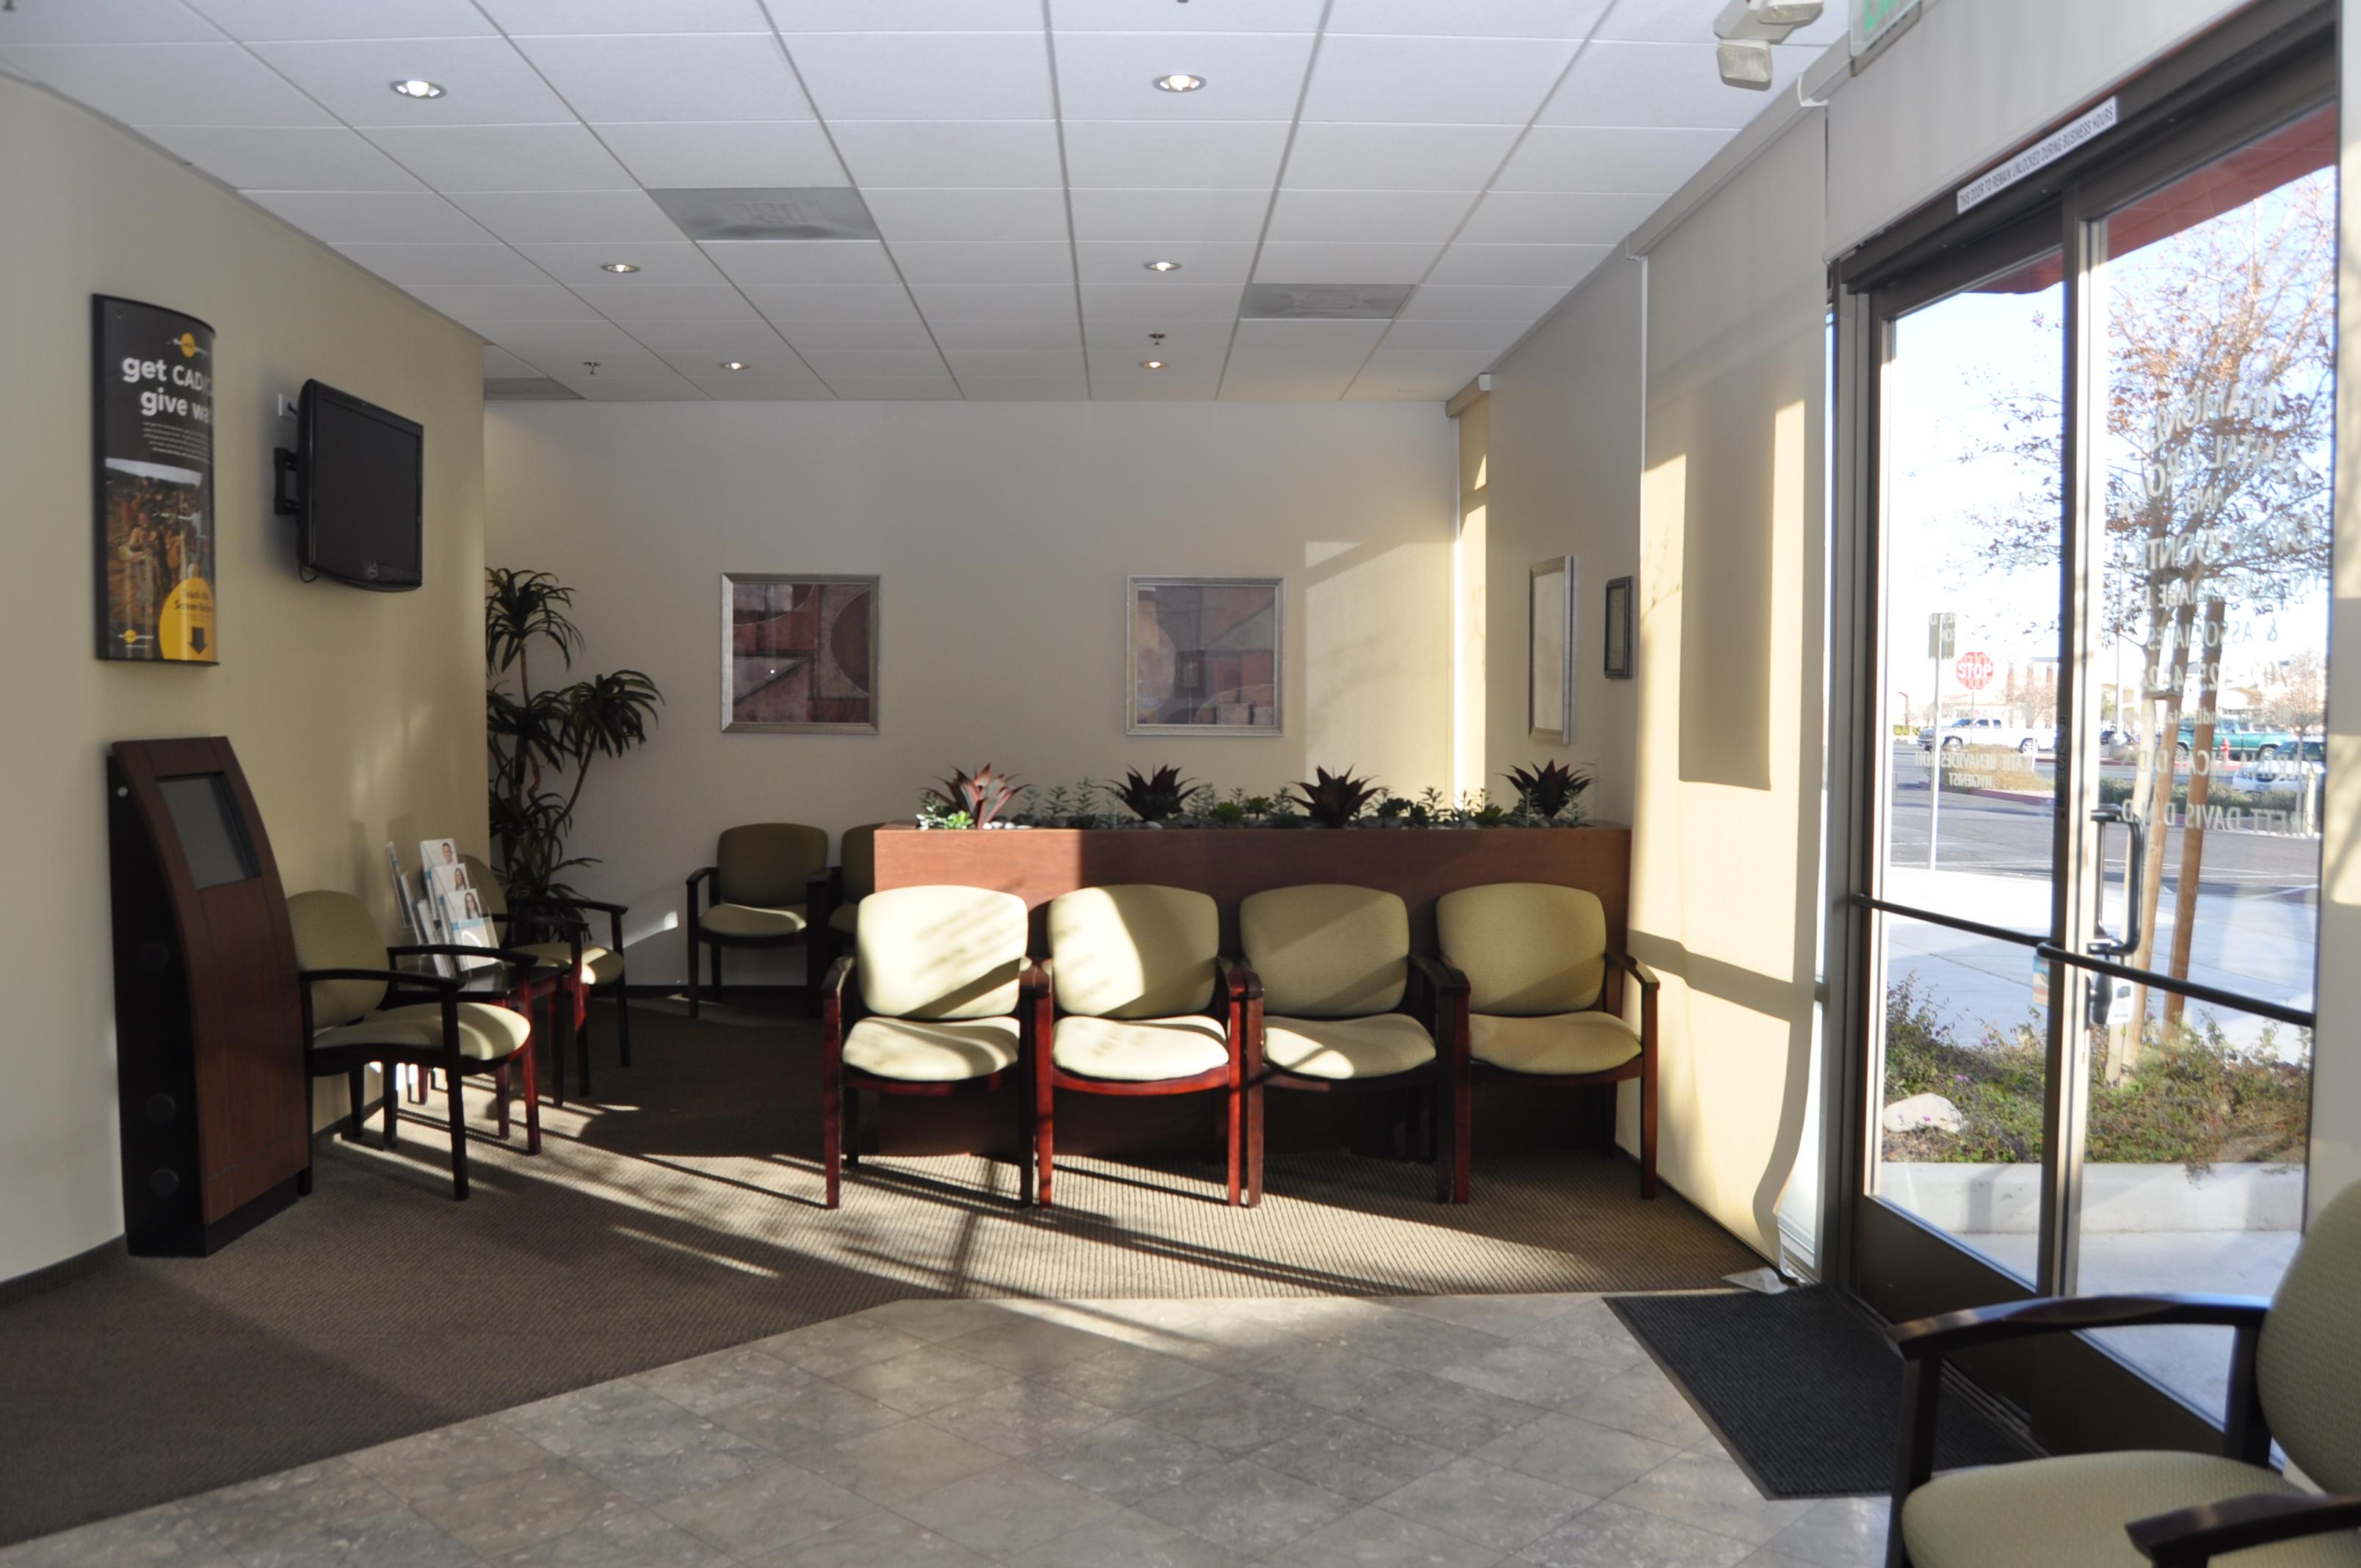 Diamond Dental Group and Orthodontics image 4